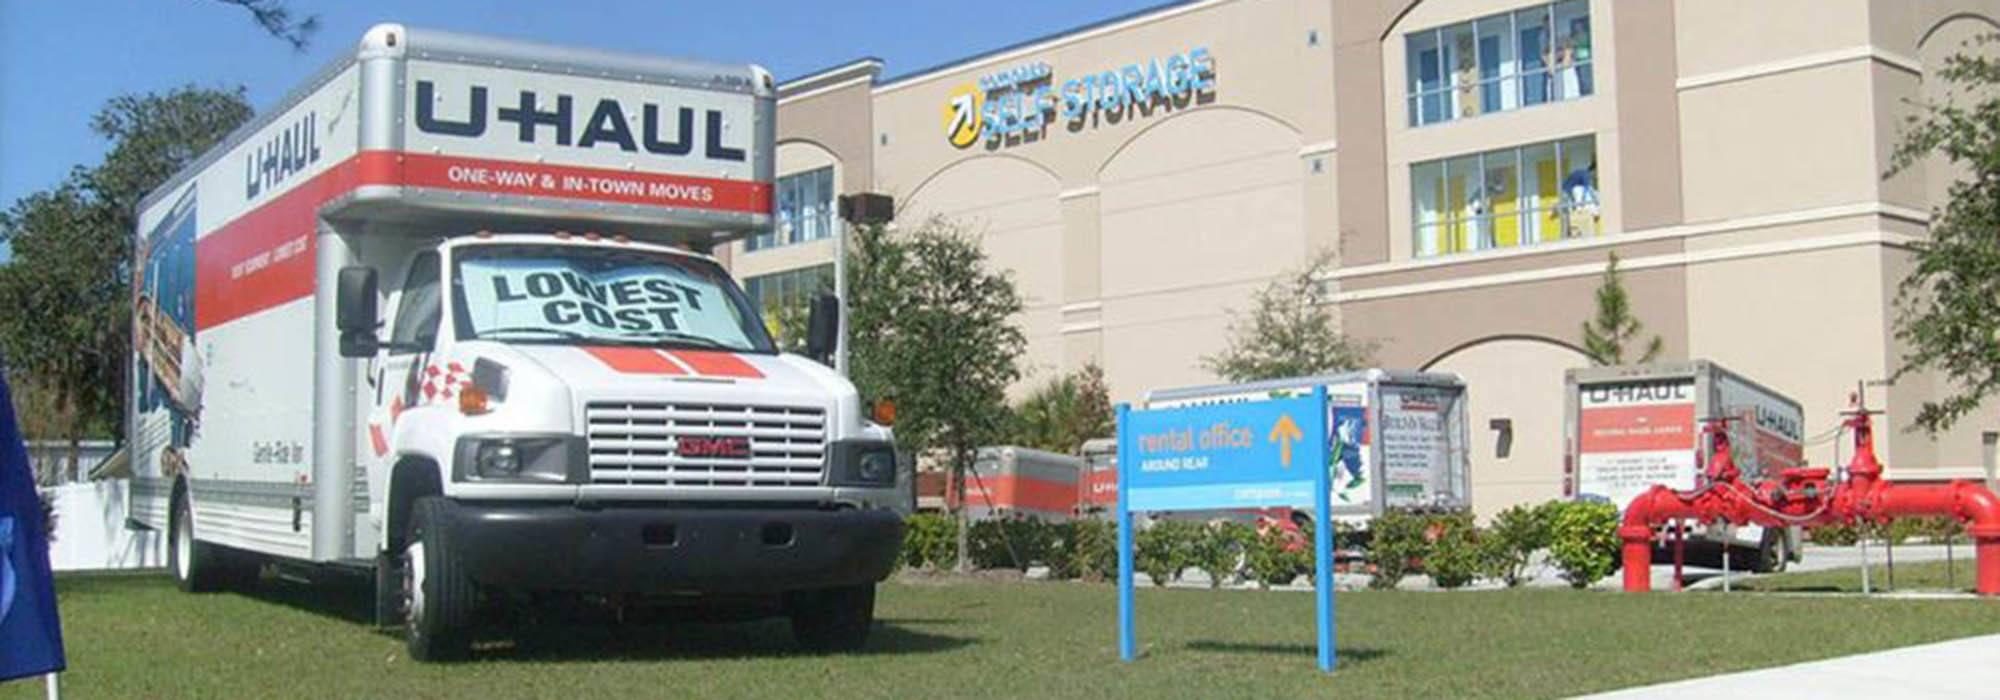 Self storage in Sarasota FL & Self Storage Units Sarasota FL   Compass #101 (University)